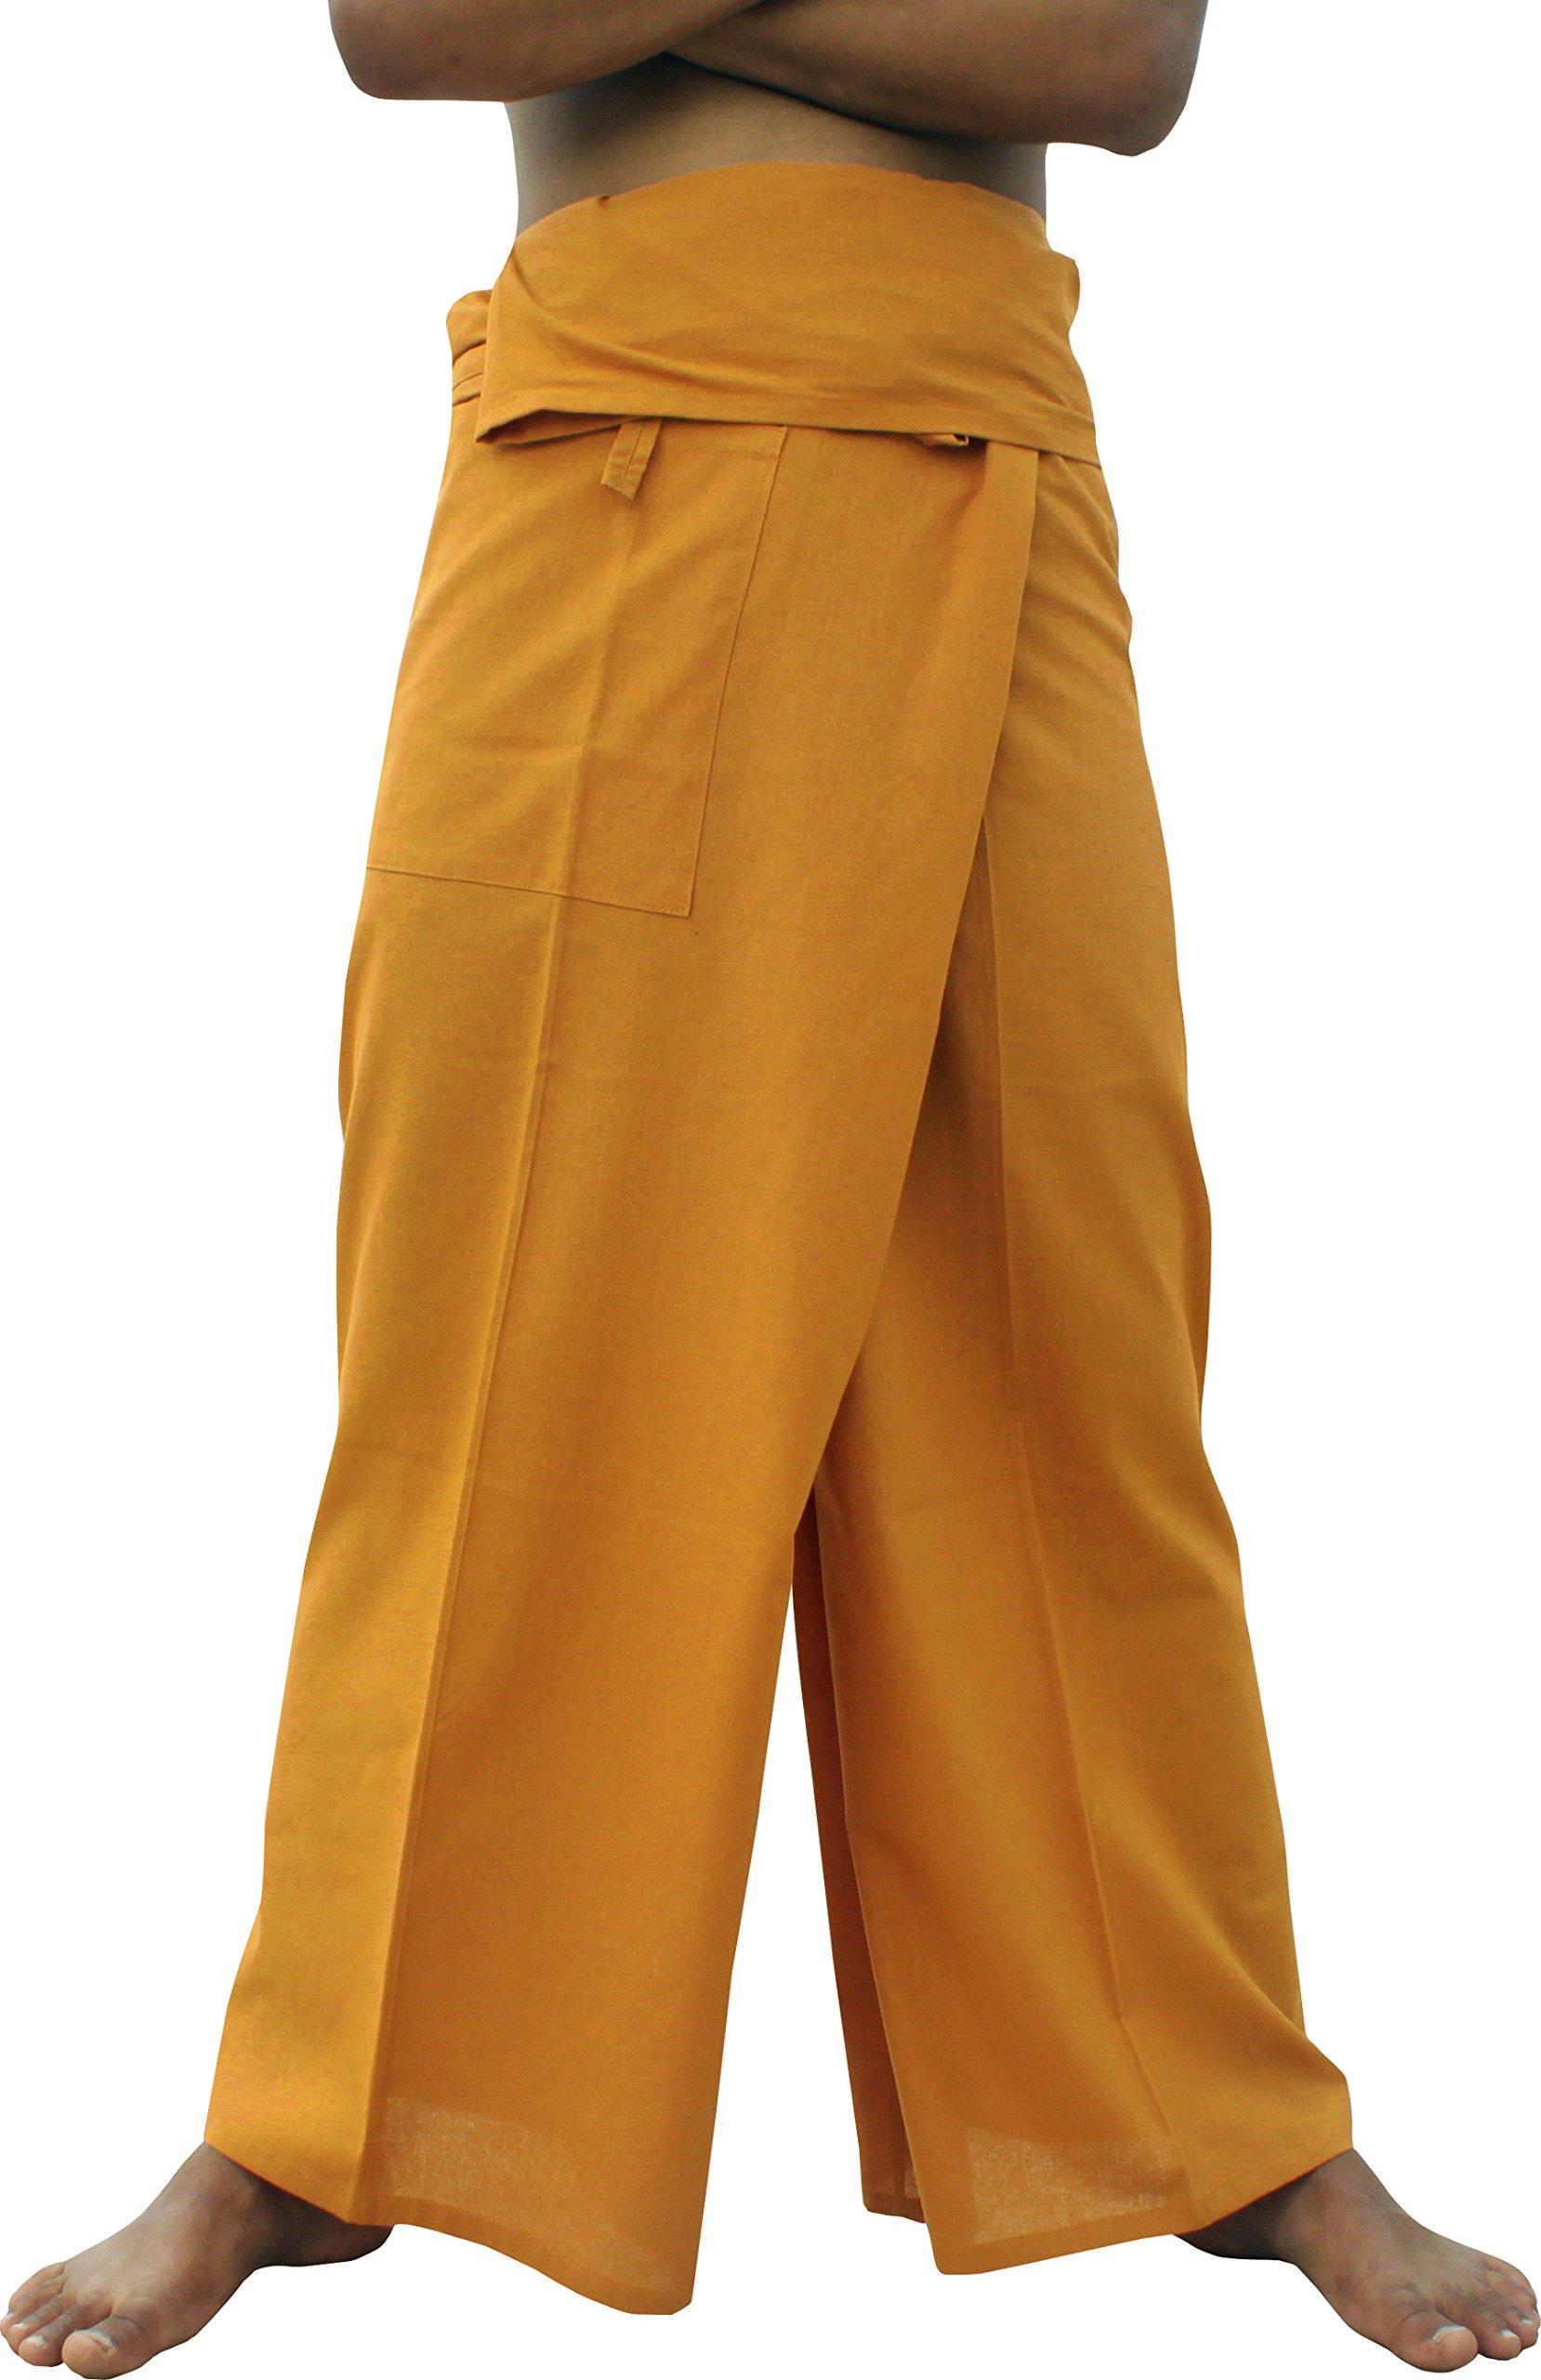 RaanPahMuang Brand Light Summer Cotton Thai Plus Fisherman Wrap Pants, XX-Large, Copper Brown by RaanPahMuang